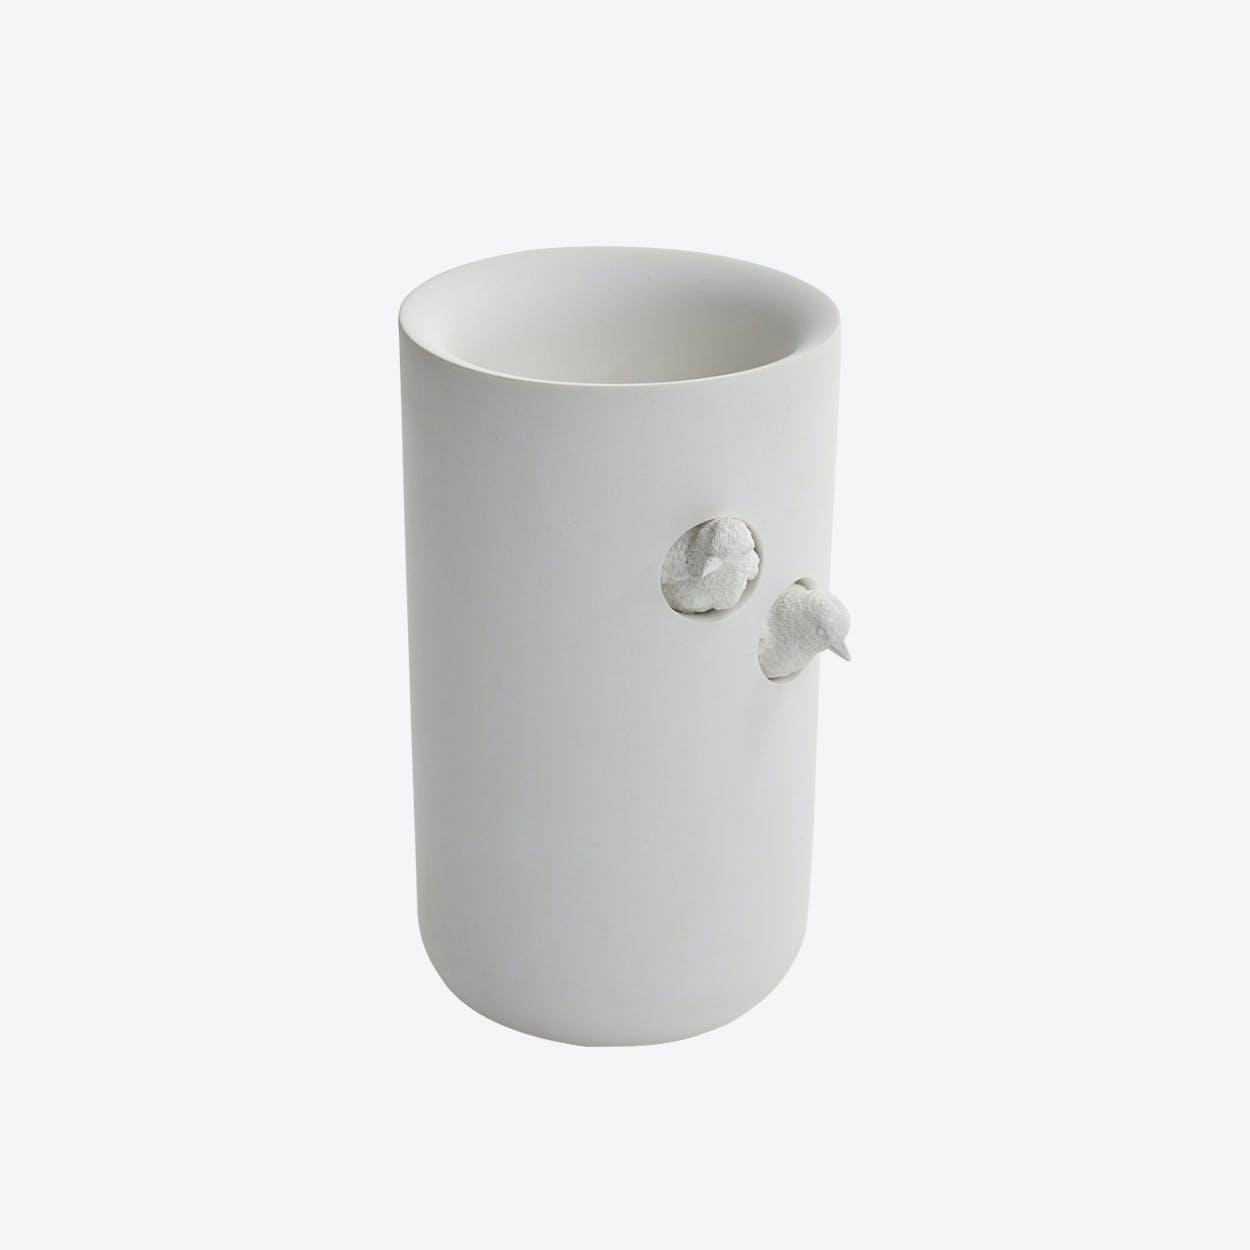 Sparrow Vase - Large